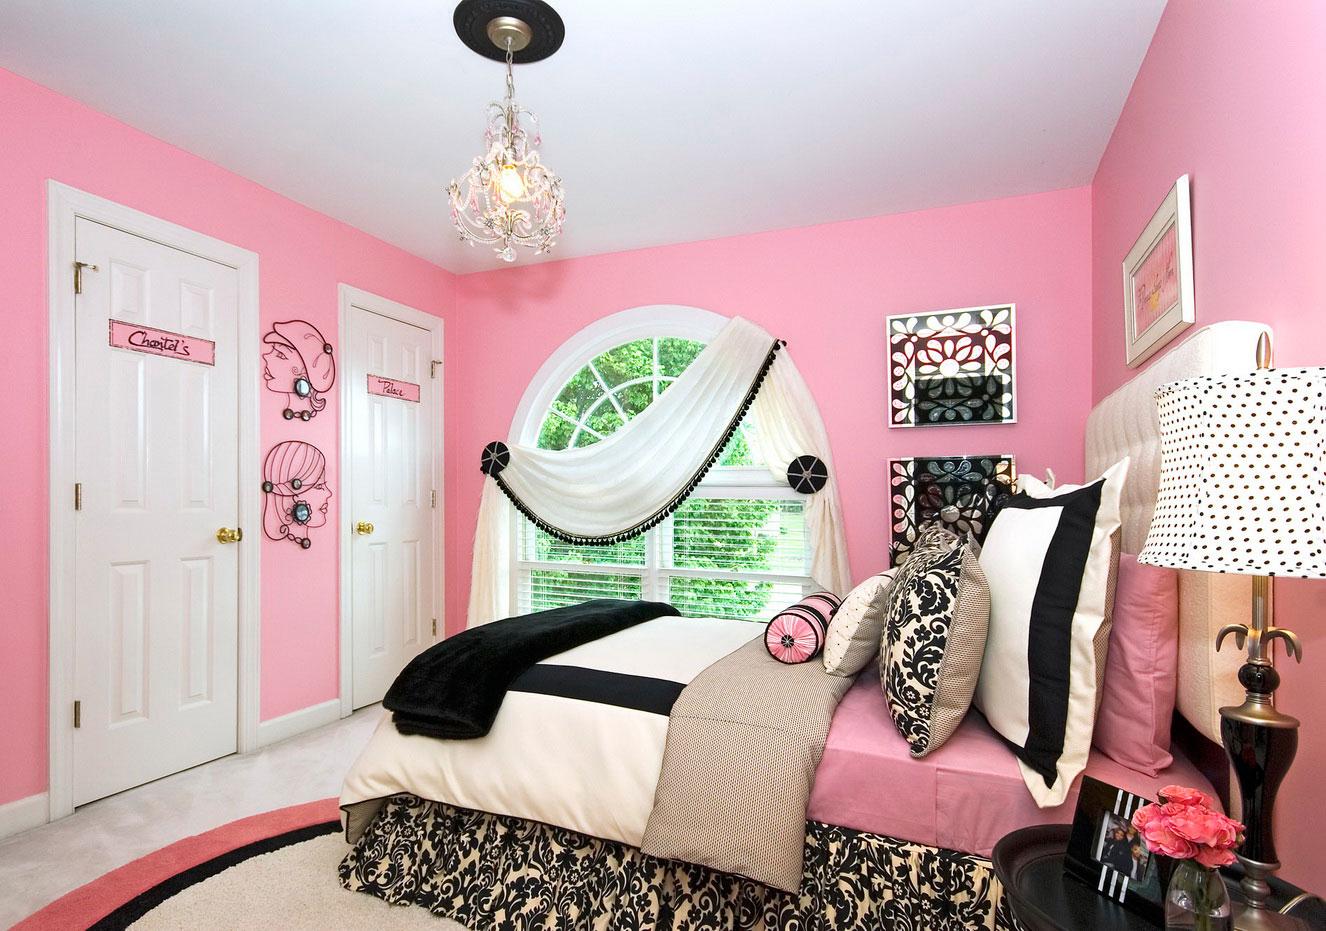 Free Download Ideas For Teenage Girl Cute Bedroom Wallpaper 1326x931 Your Desktop Mobile Tablet Explore 45 Teen Rooms Wallpapers Girls